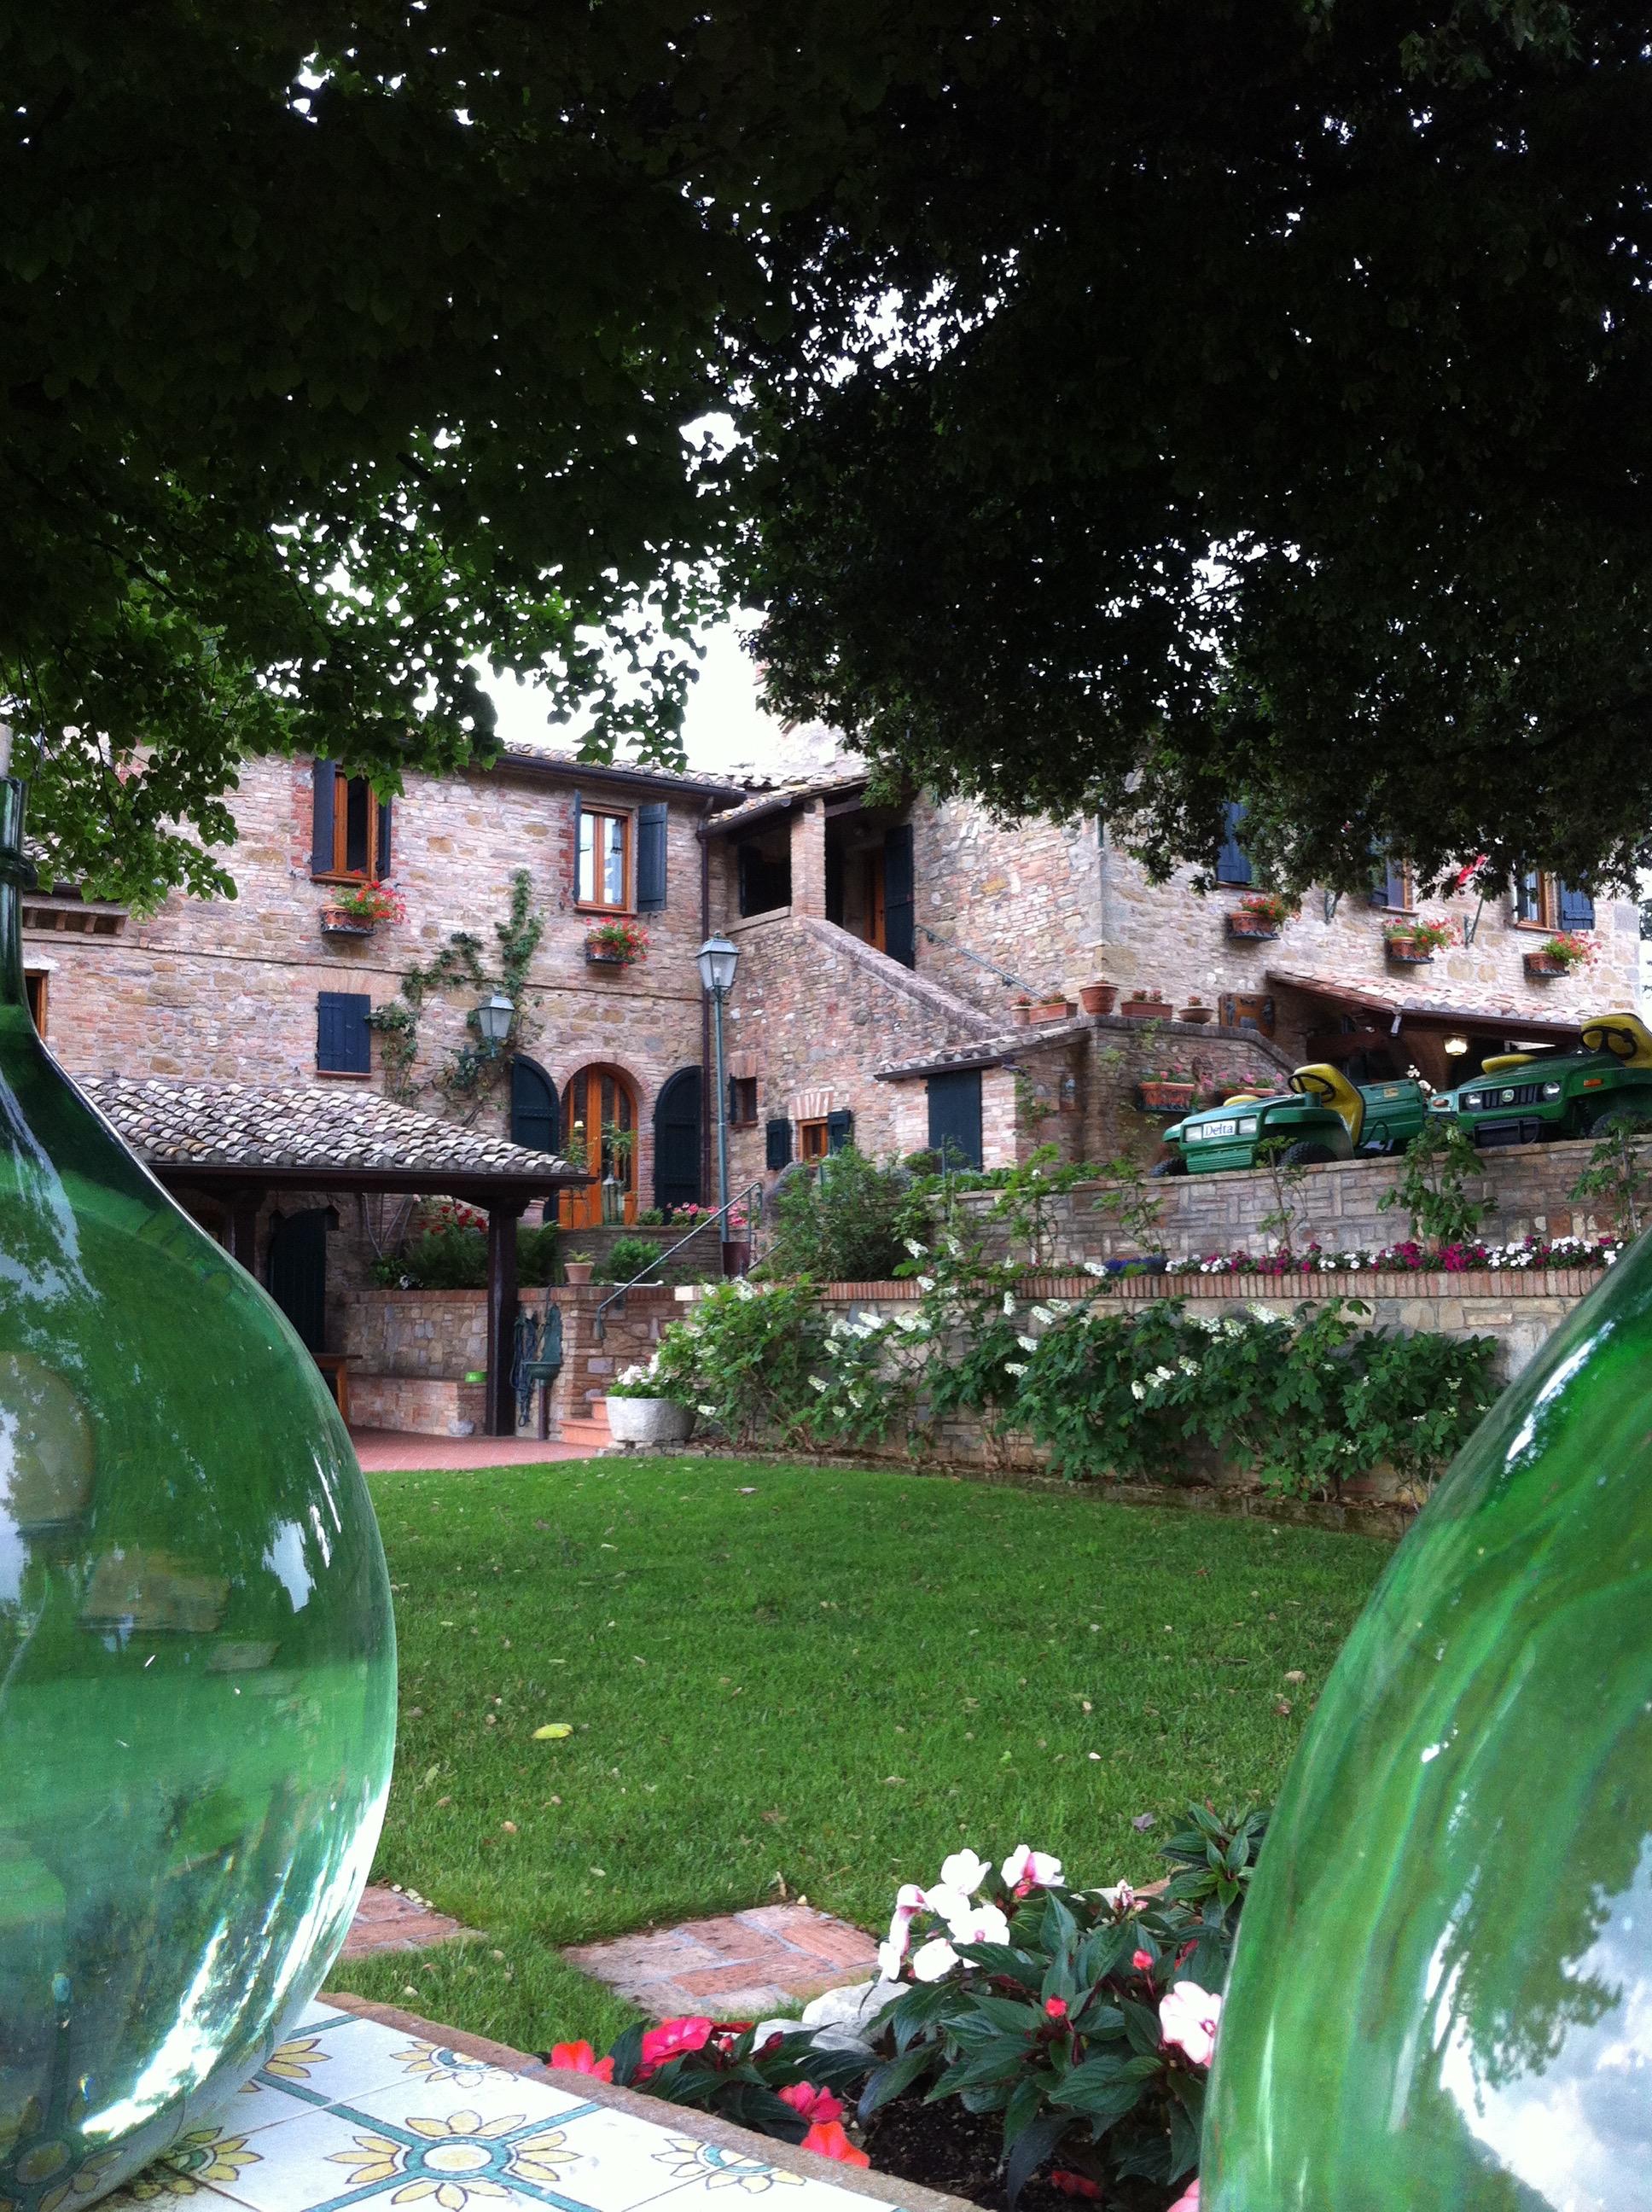 side-view-villa.jpg